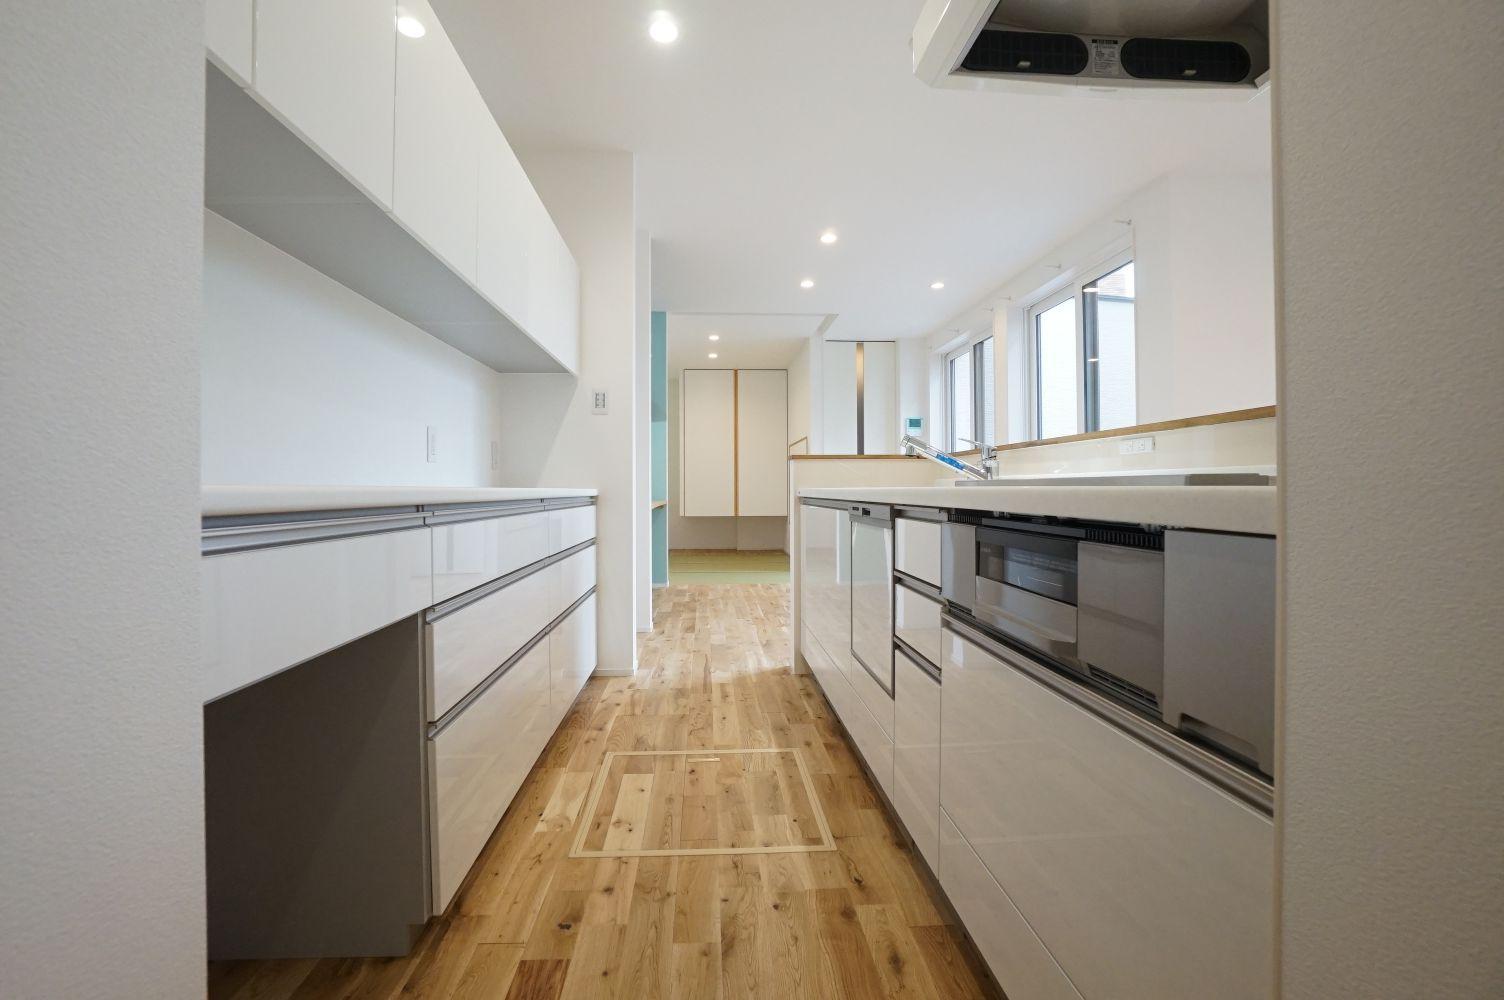 RIKYU (リキュー)【デザイン住宅、間取り、建築家】白いキッチンは奥さまのこだわり。ぐるぐると回遊できるので、家事負担も軽減される。収納も充実